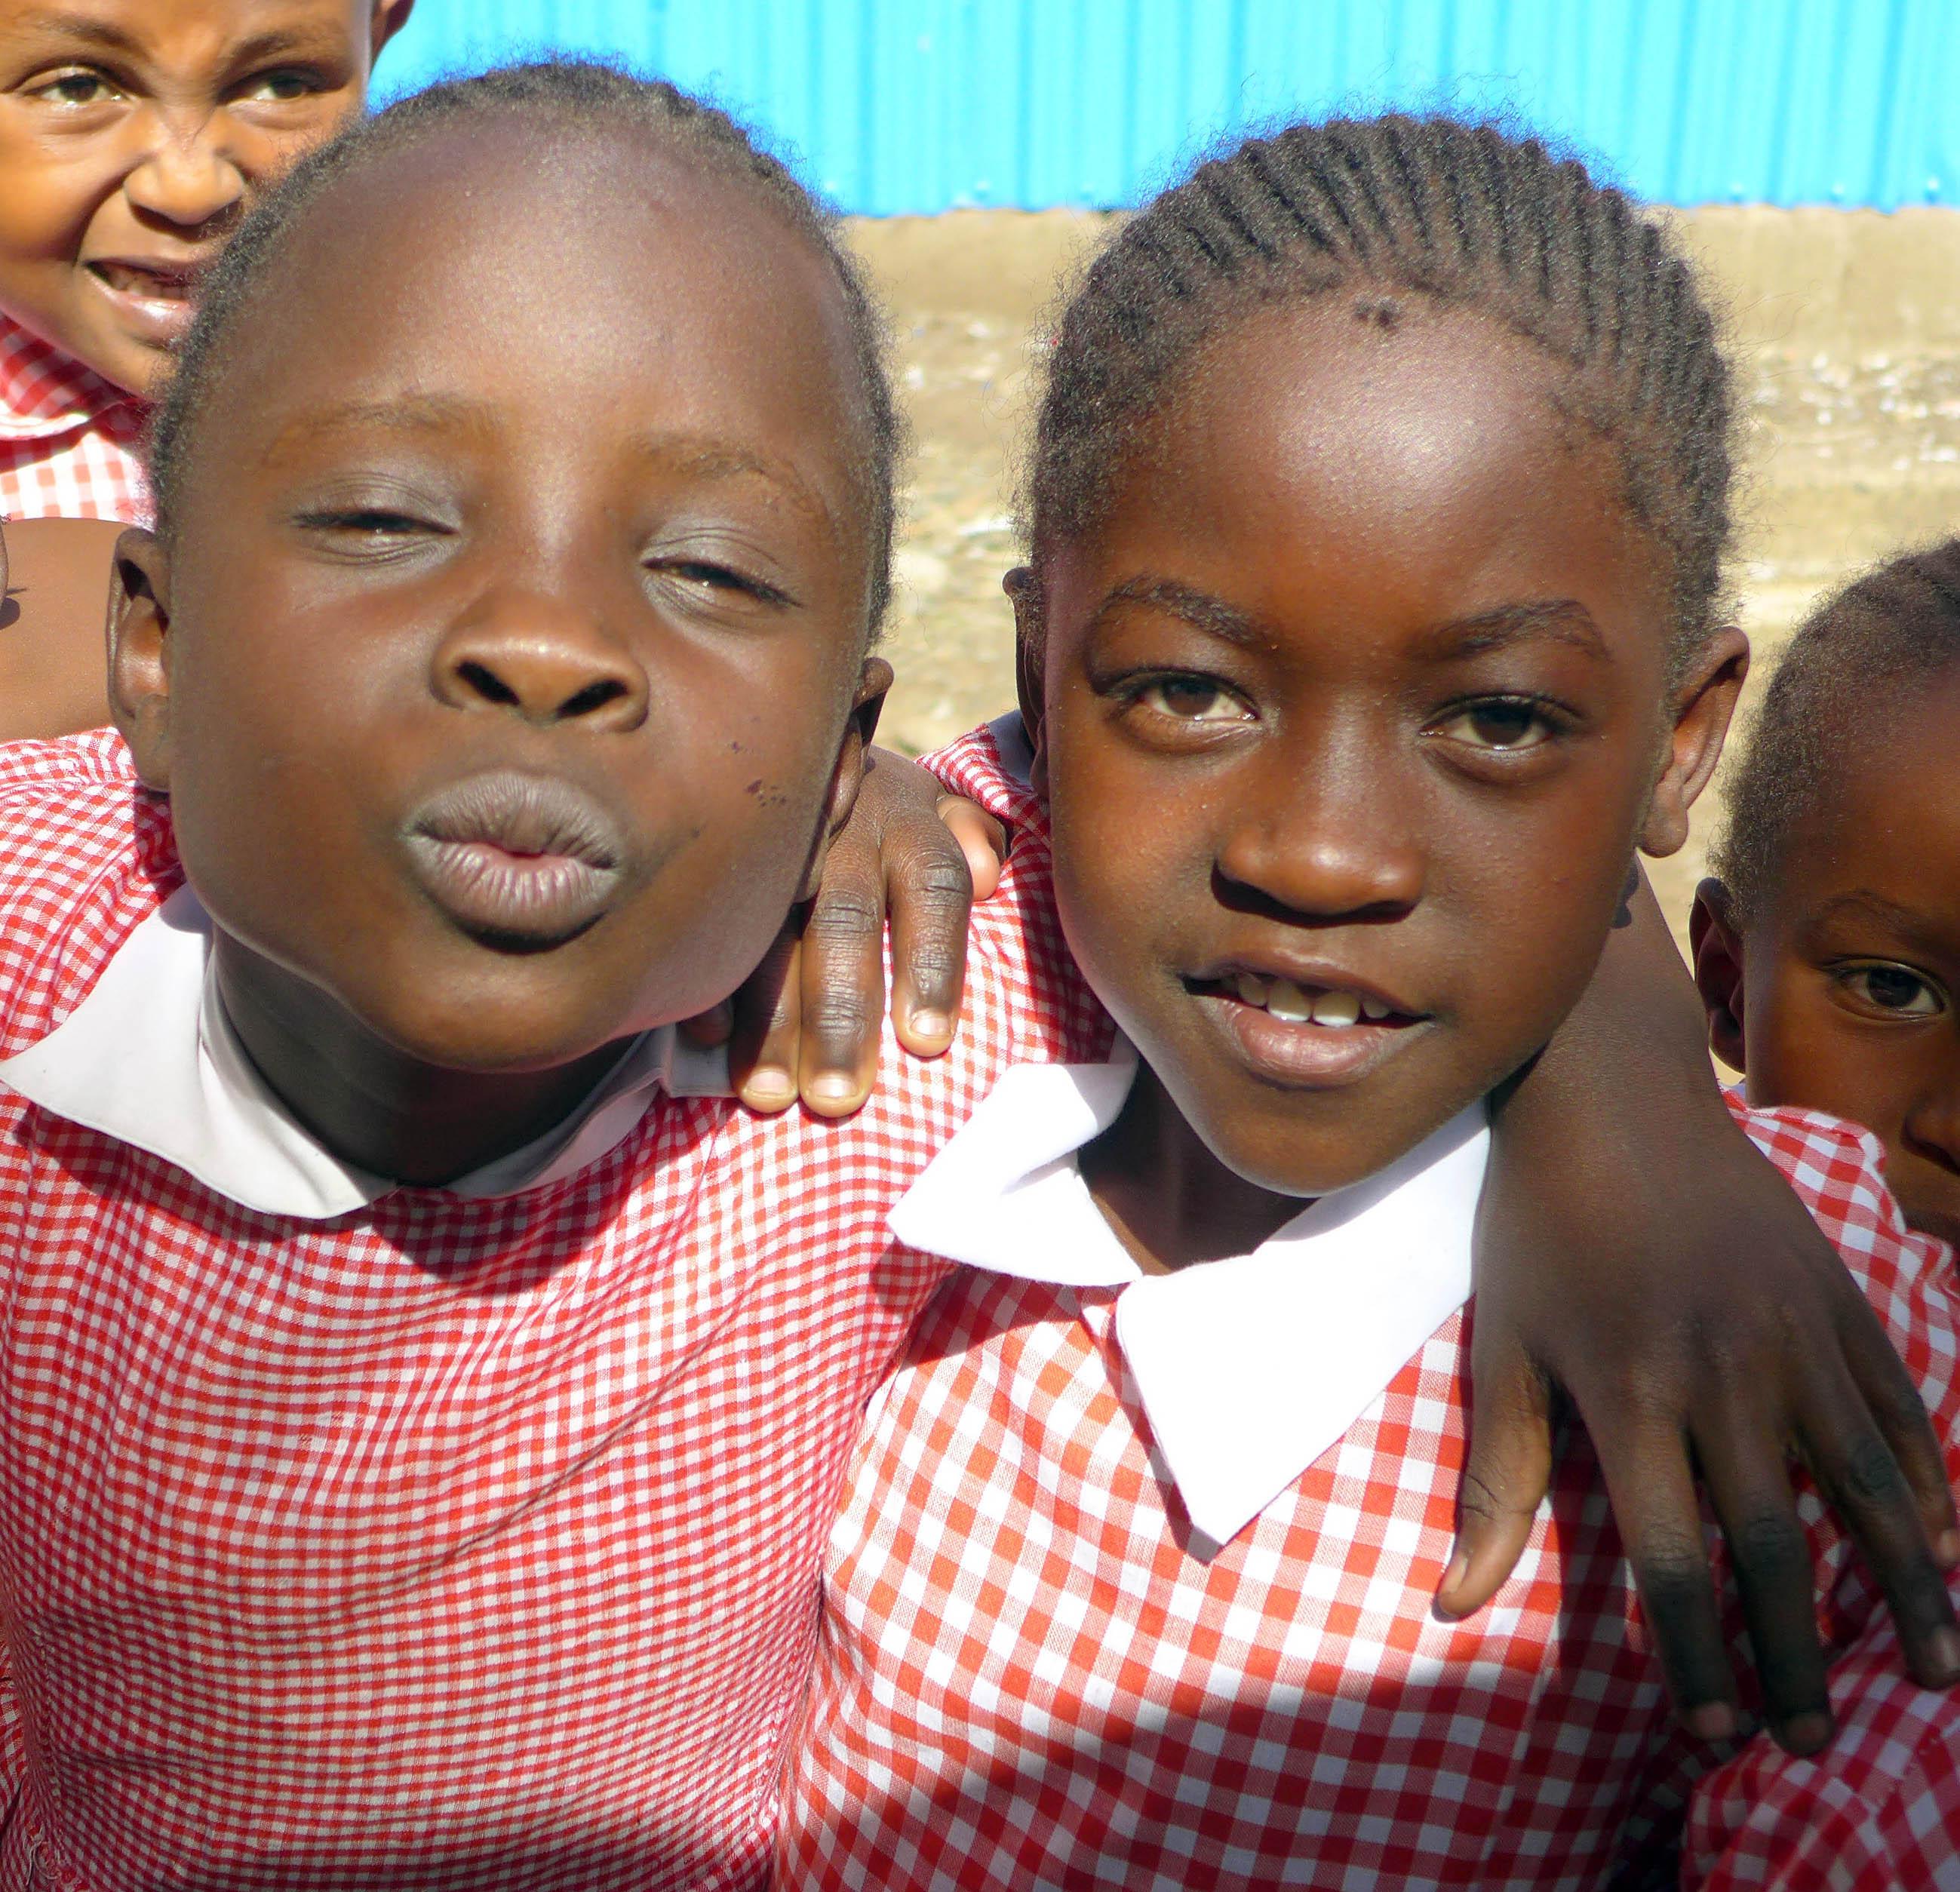 School children at the Kibera Paper location